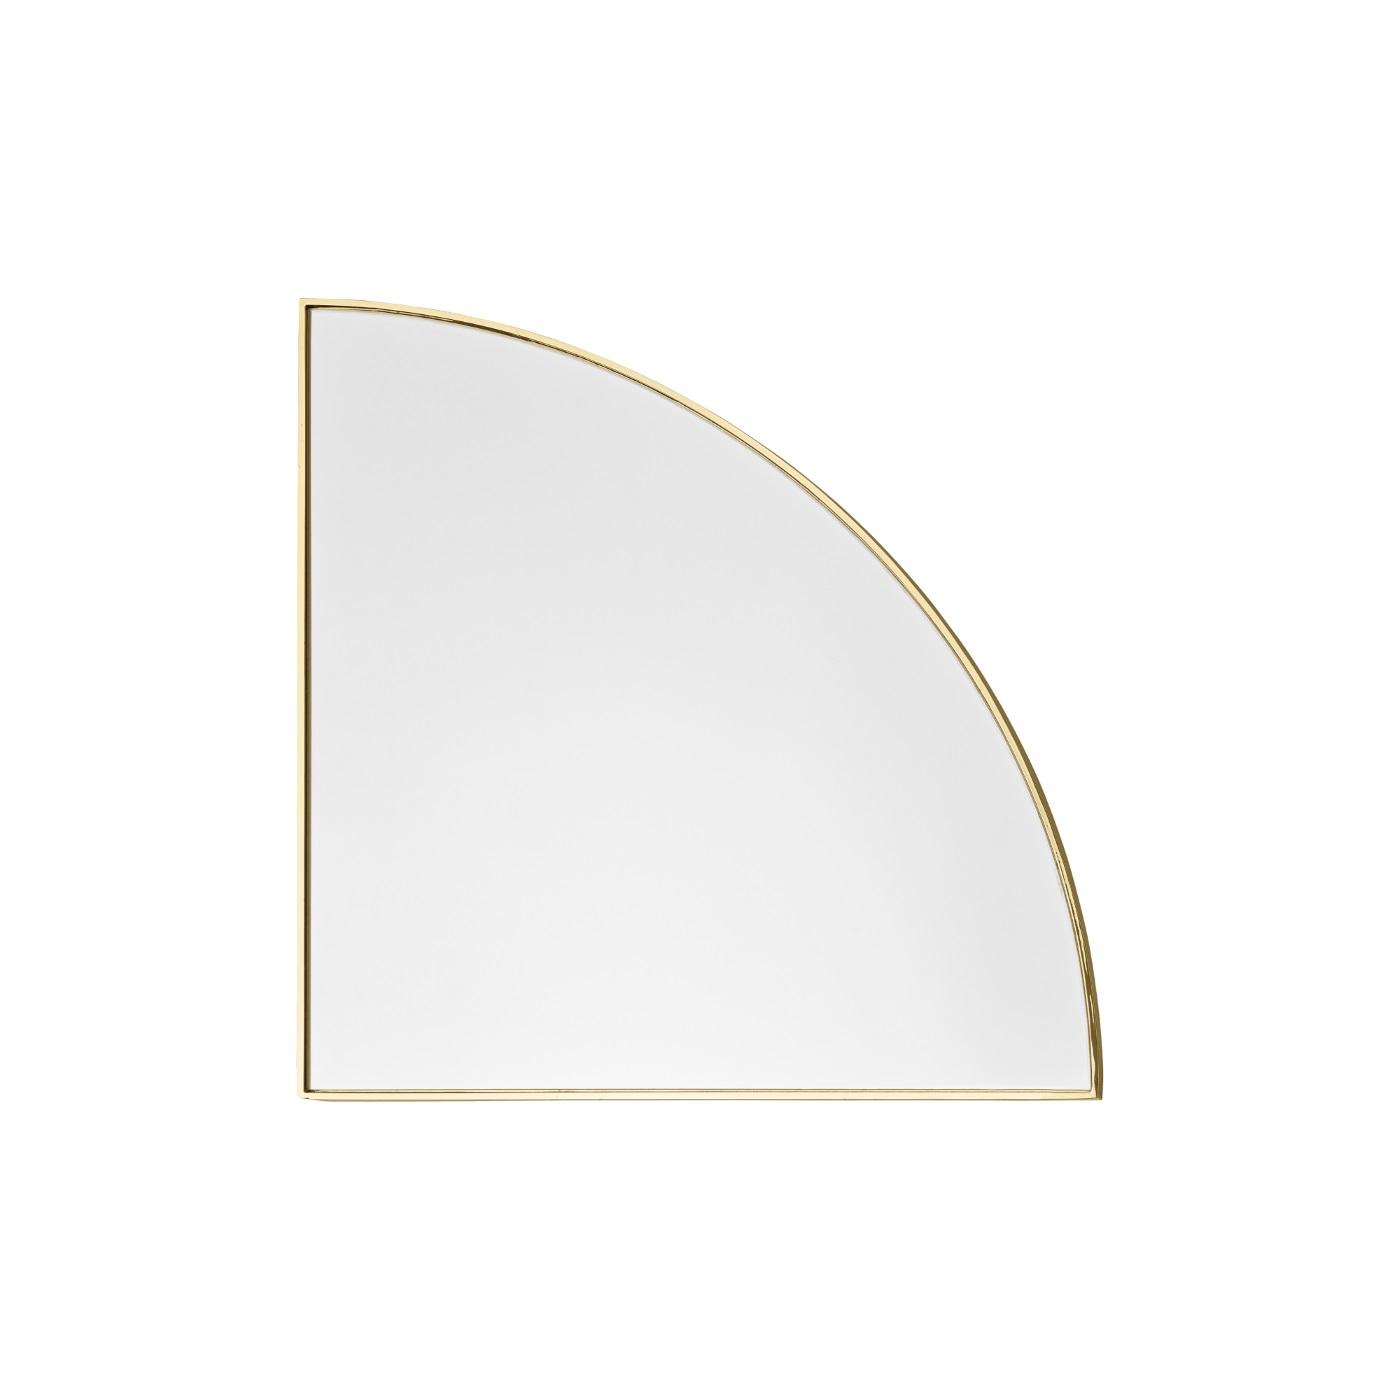 Spegel UNITY kvarts cirkel guld, AYTM